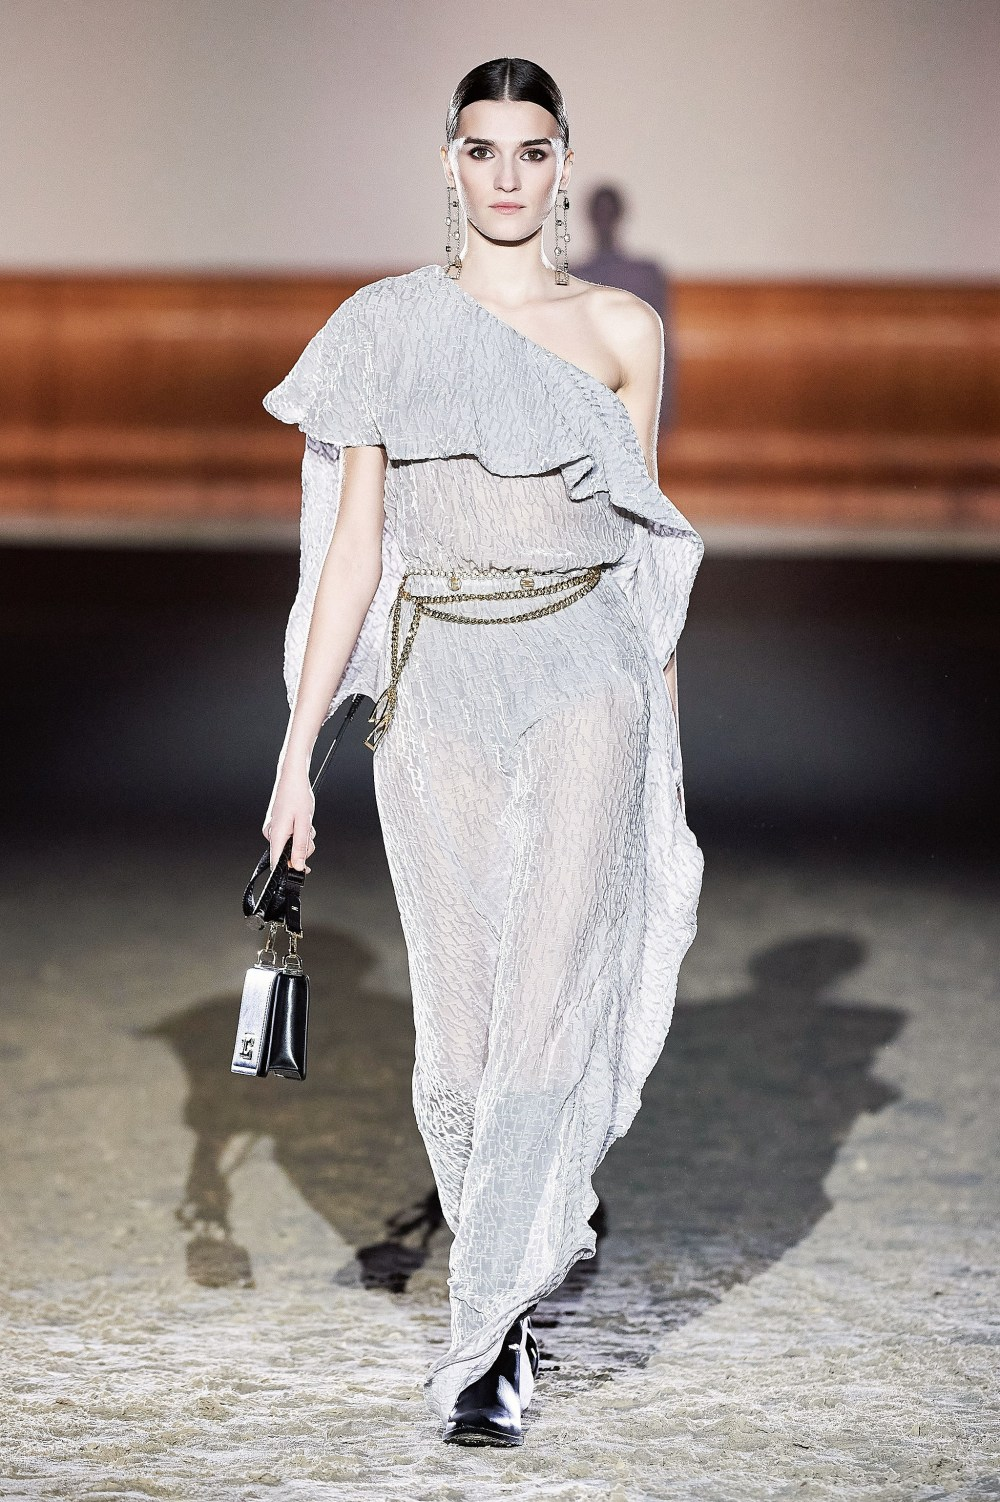 Elisabetta Franchi: Elisabetta Franchi Fall Winter 2021-22 Fashion Show Photo #26